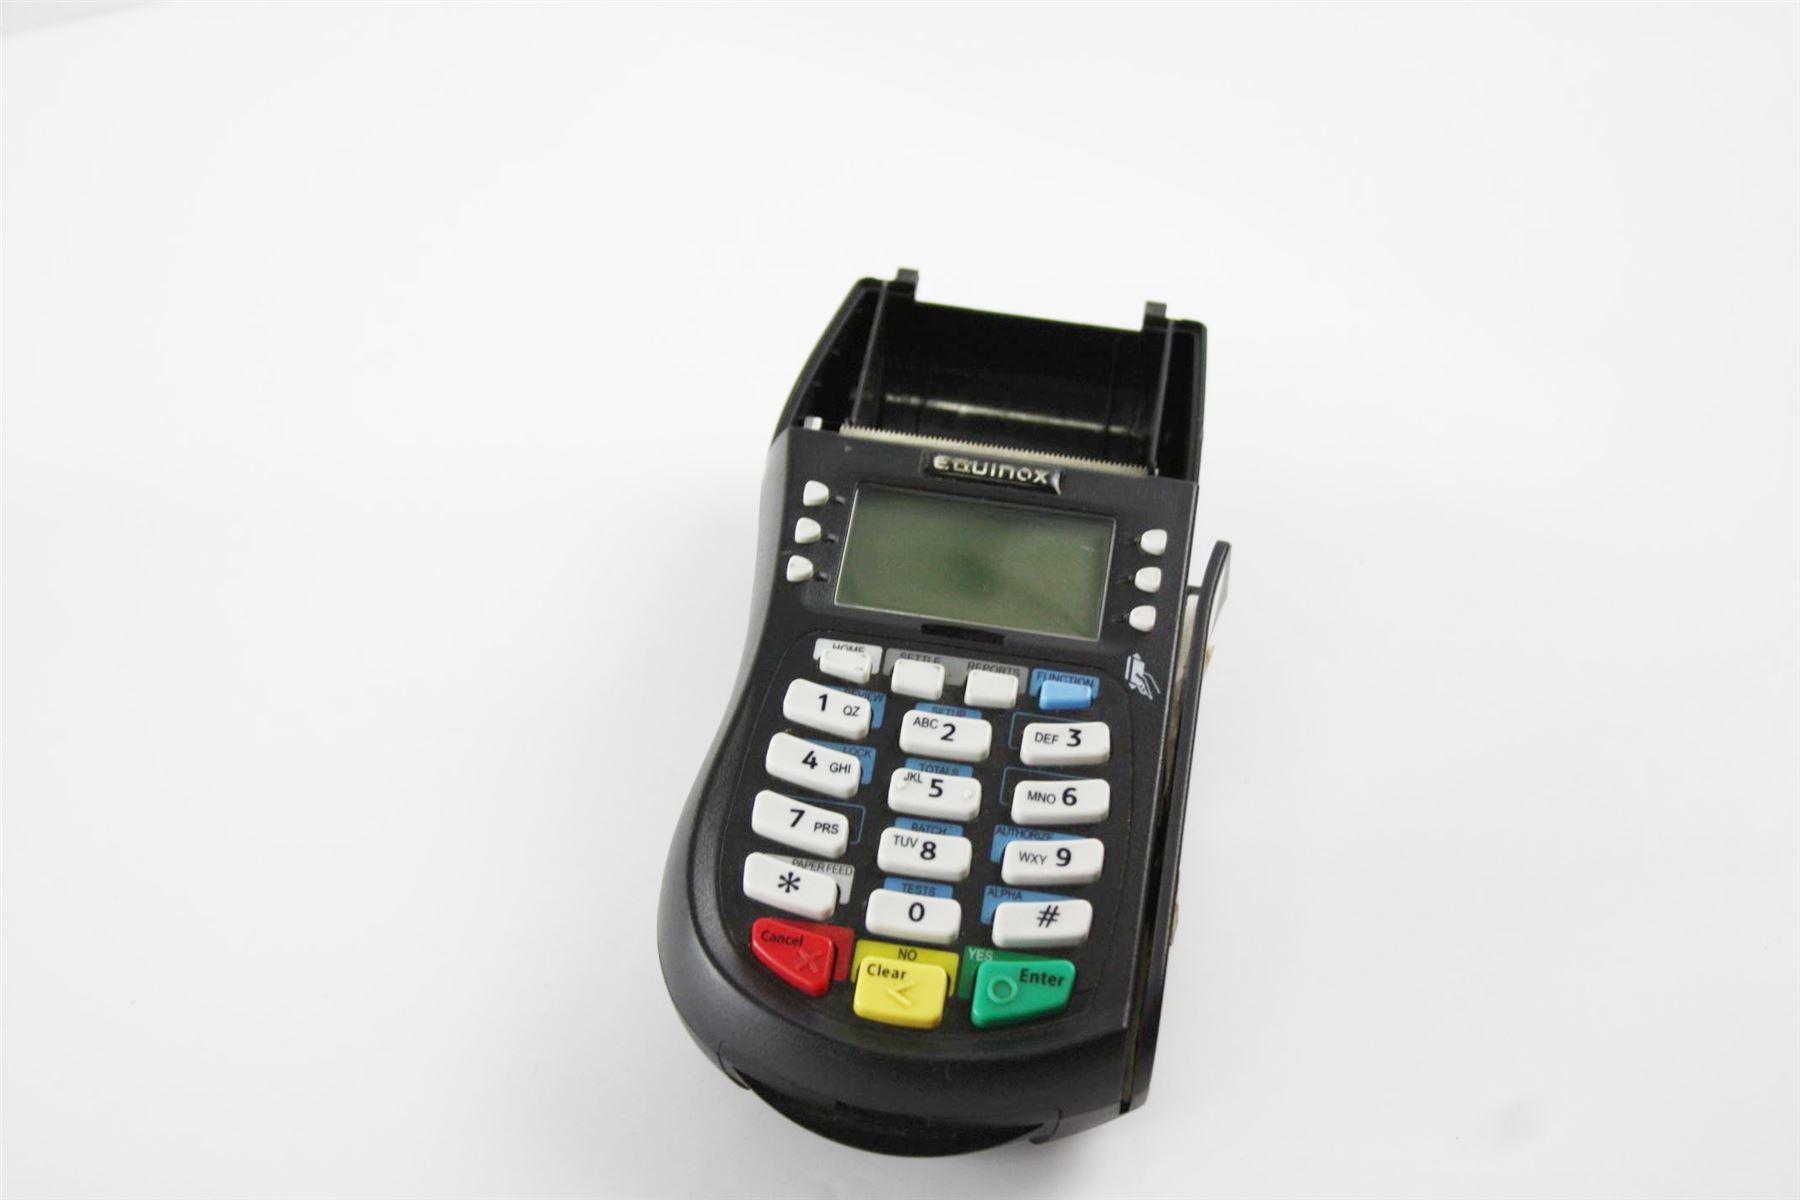 Equinox Hypercom T4220 Credit Card Reader Terminal W/O AC Adapter  010332-359R